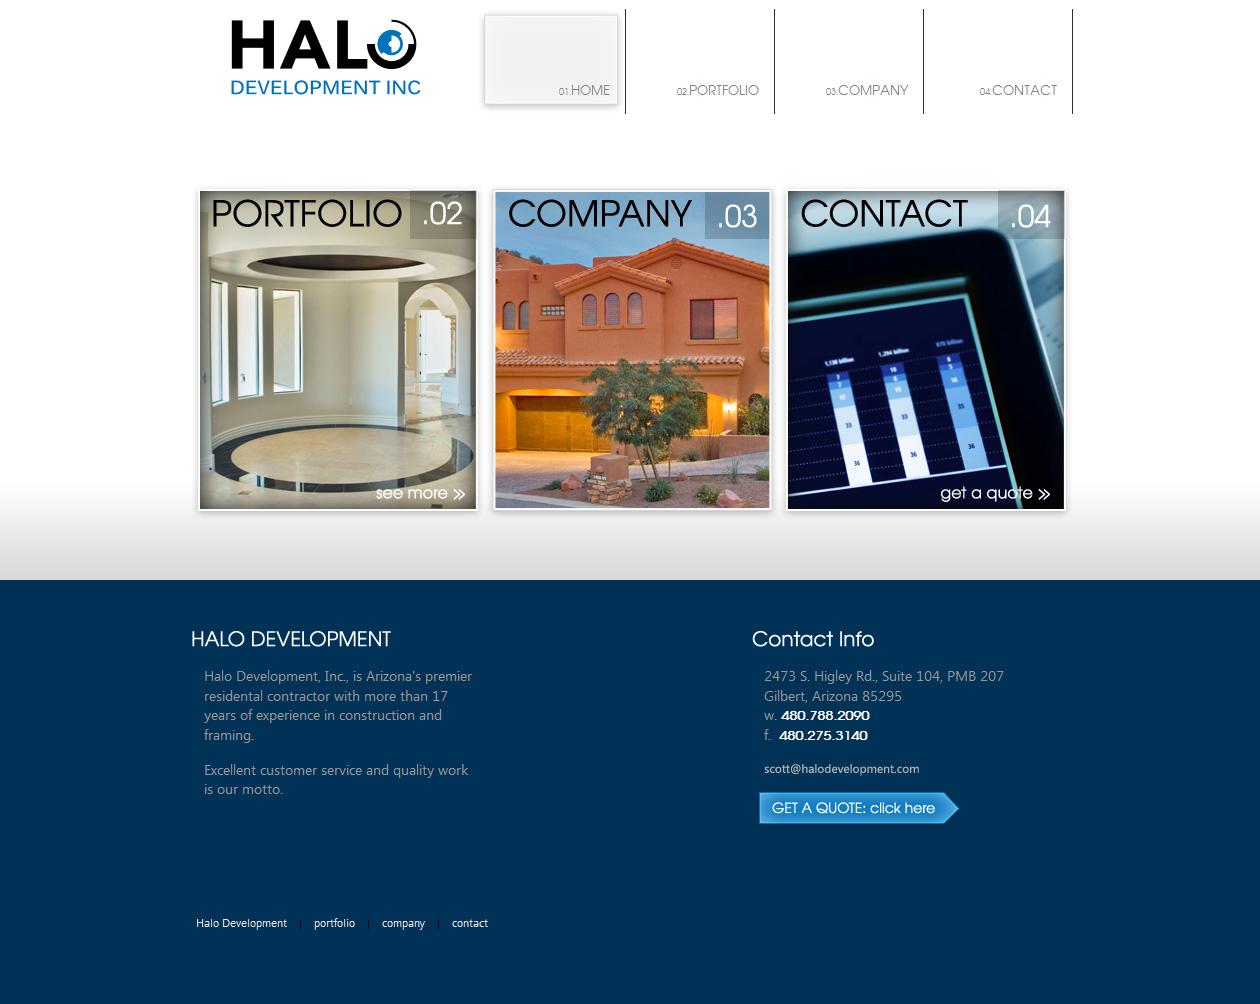 Halo_home